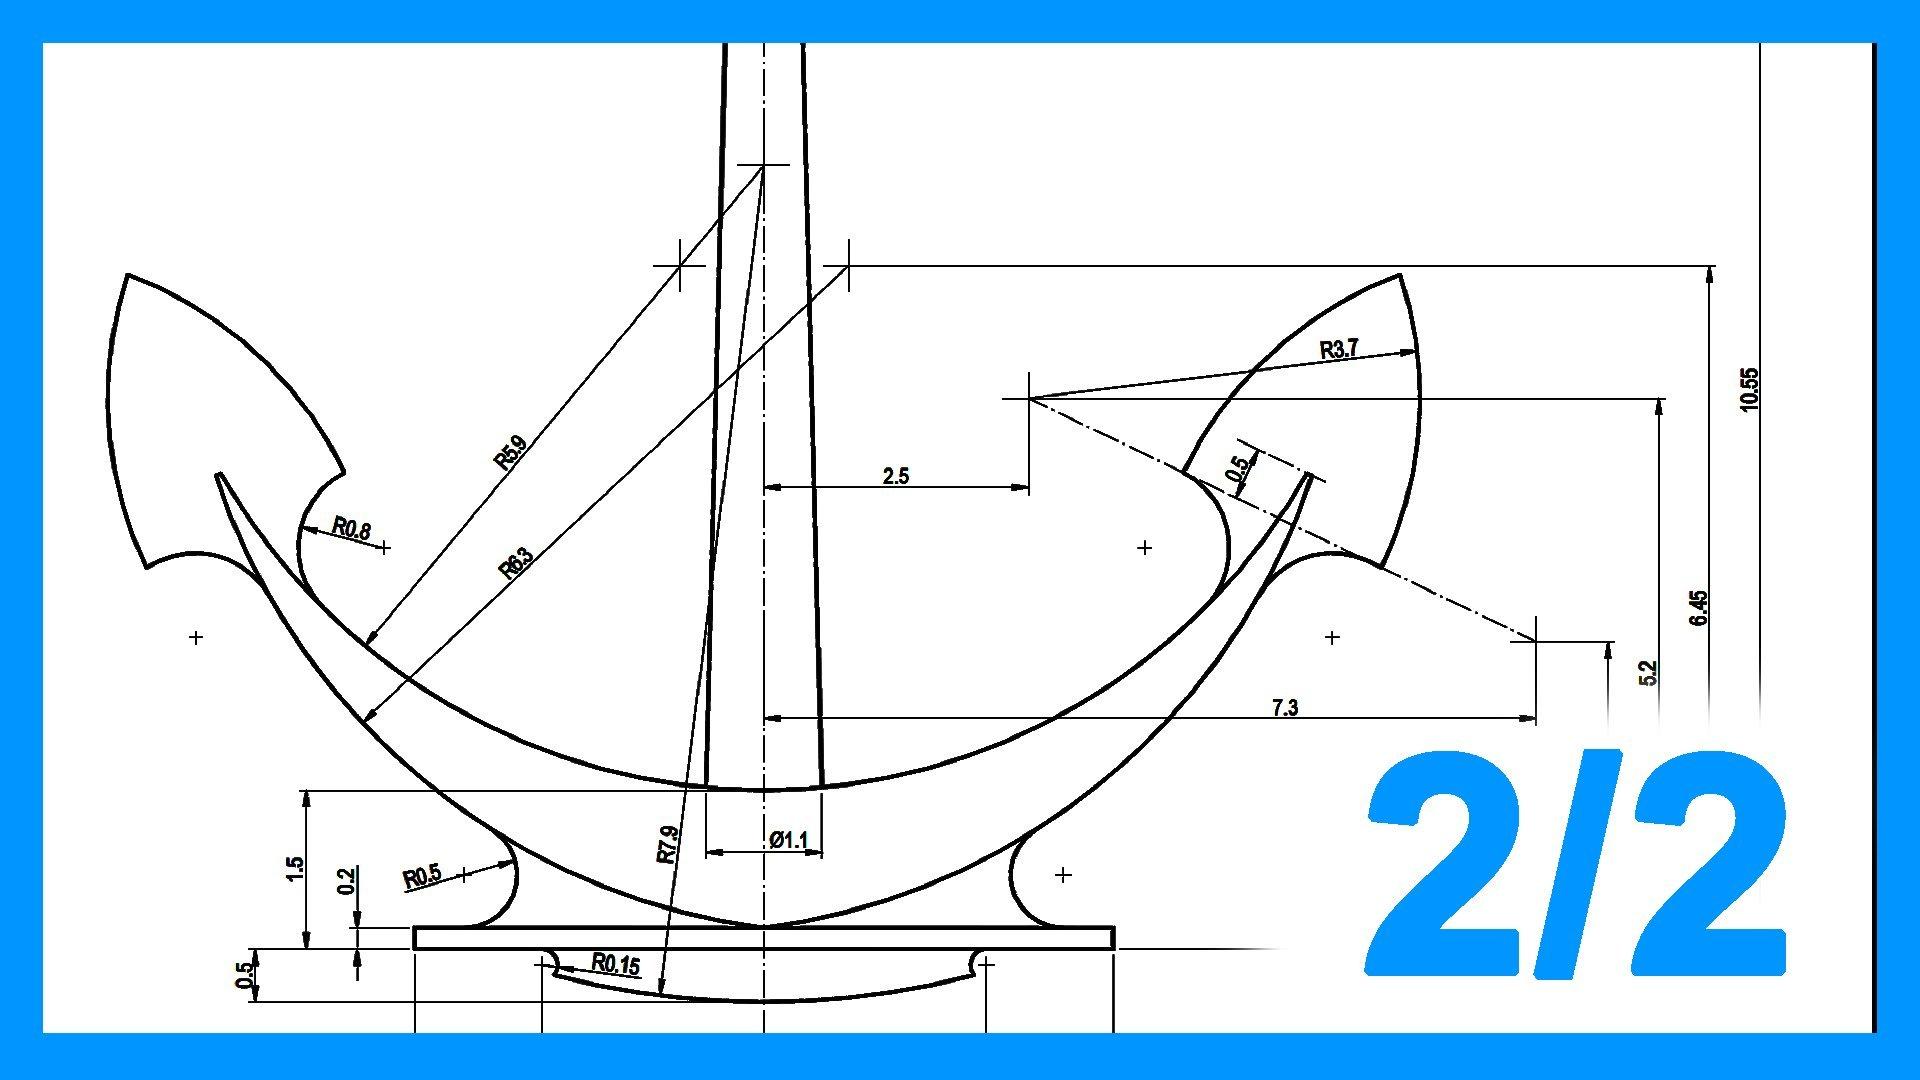 Autocad – 2/2 Ejercicio paso a paso dibujando Ancla 2D. Práctica 2D Autocad.